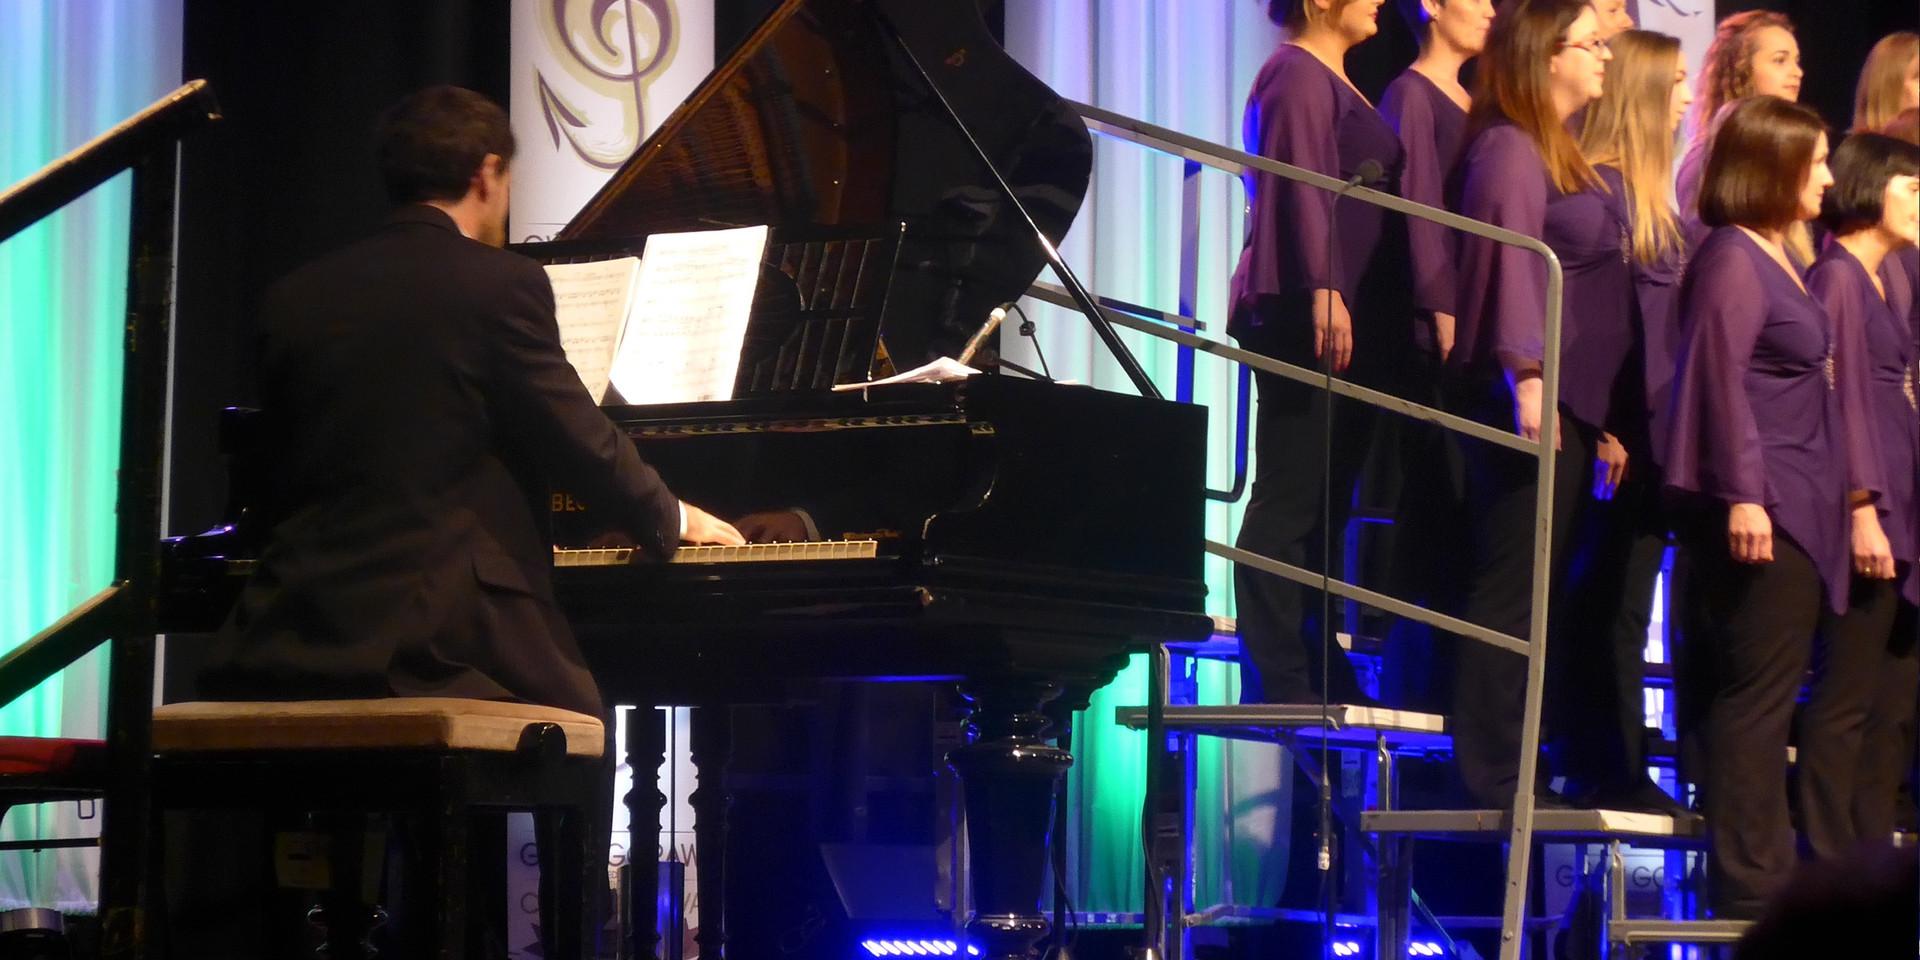 Llandudno evening concert 2017